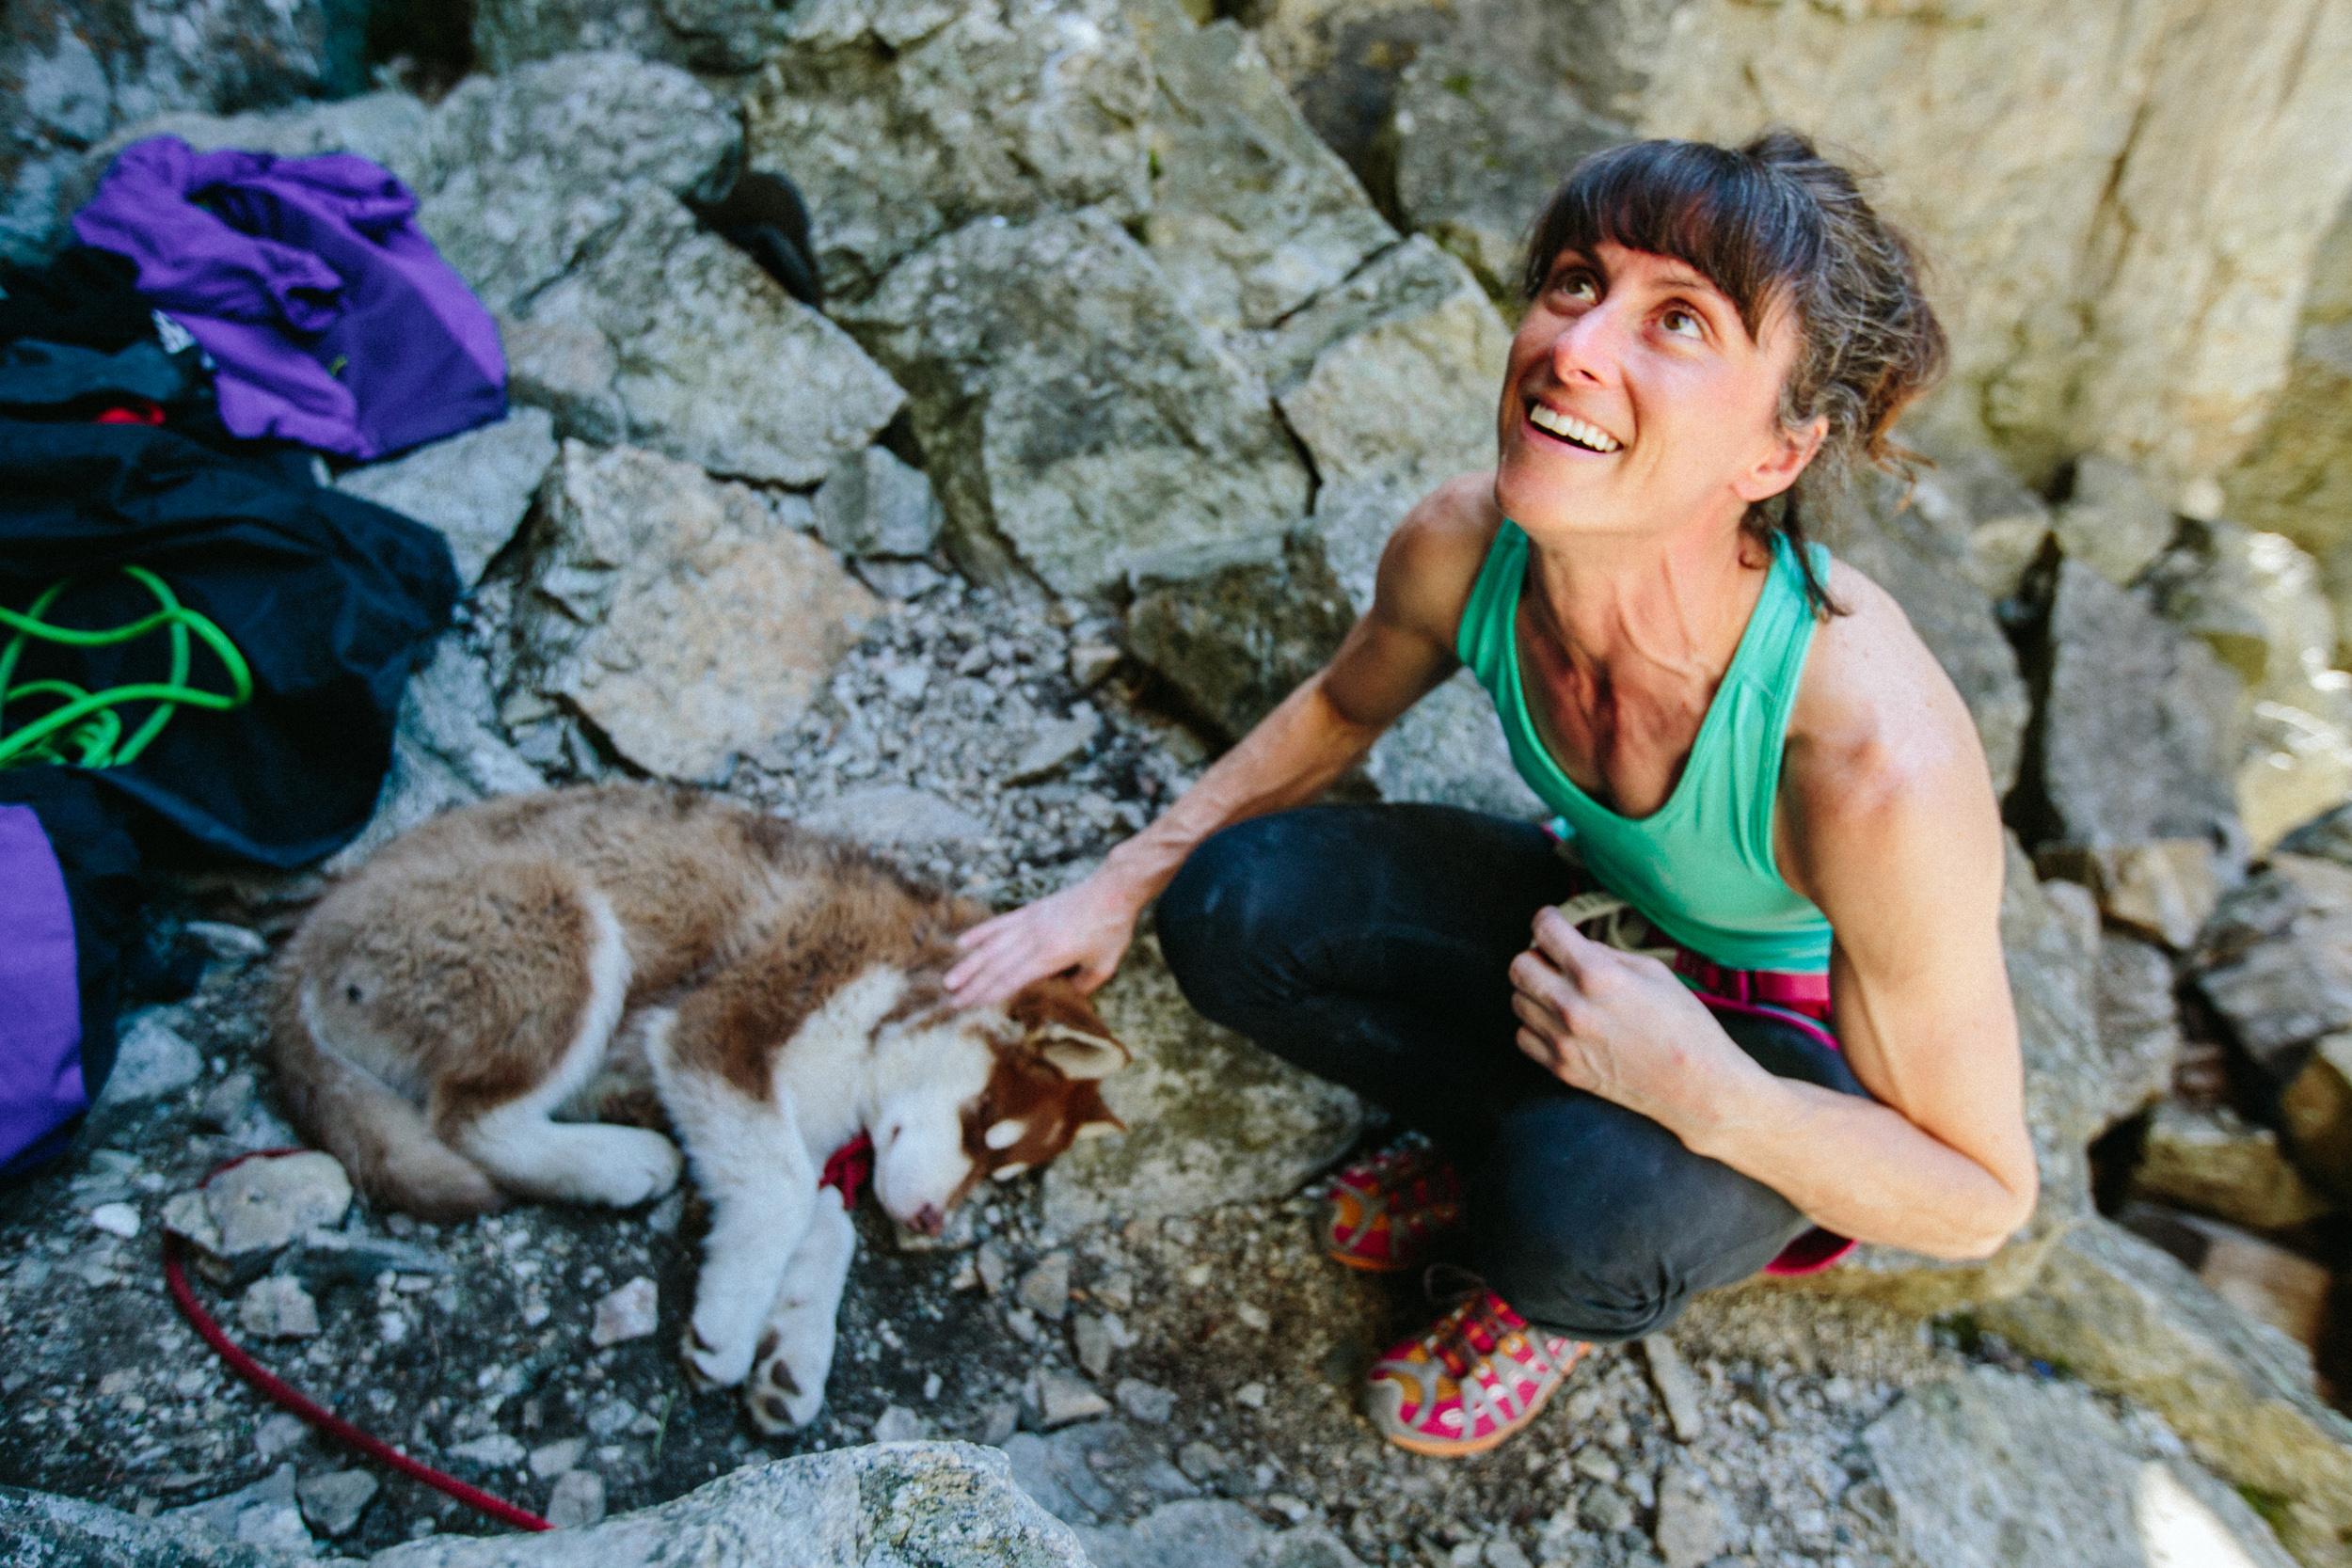 14robb-thompson-skaha-climbing-sarah-leanne-hart-.jpg